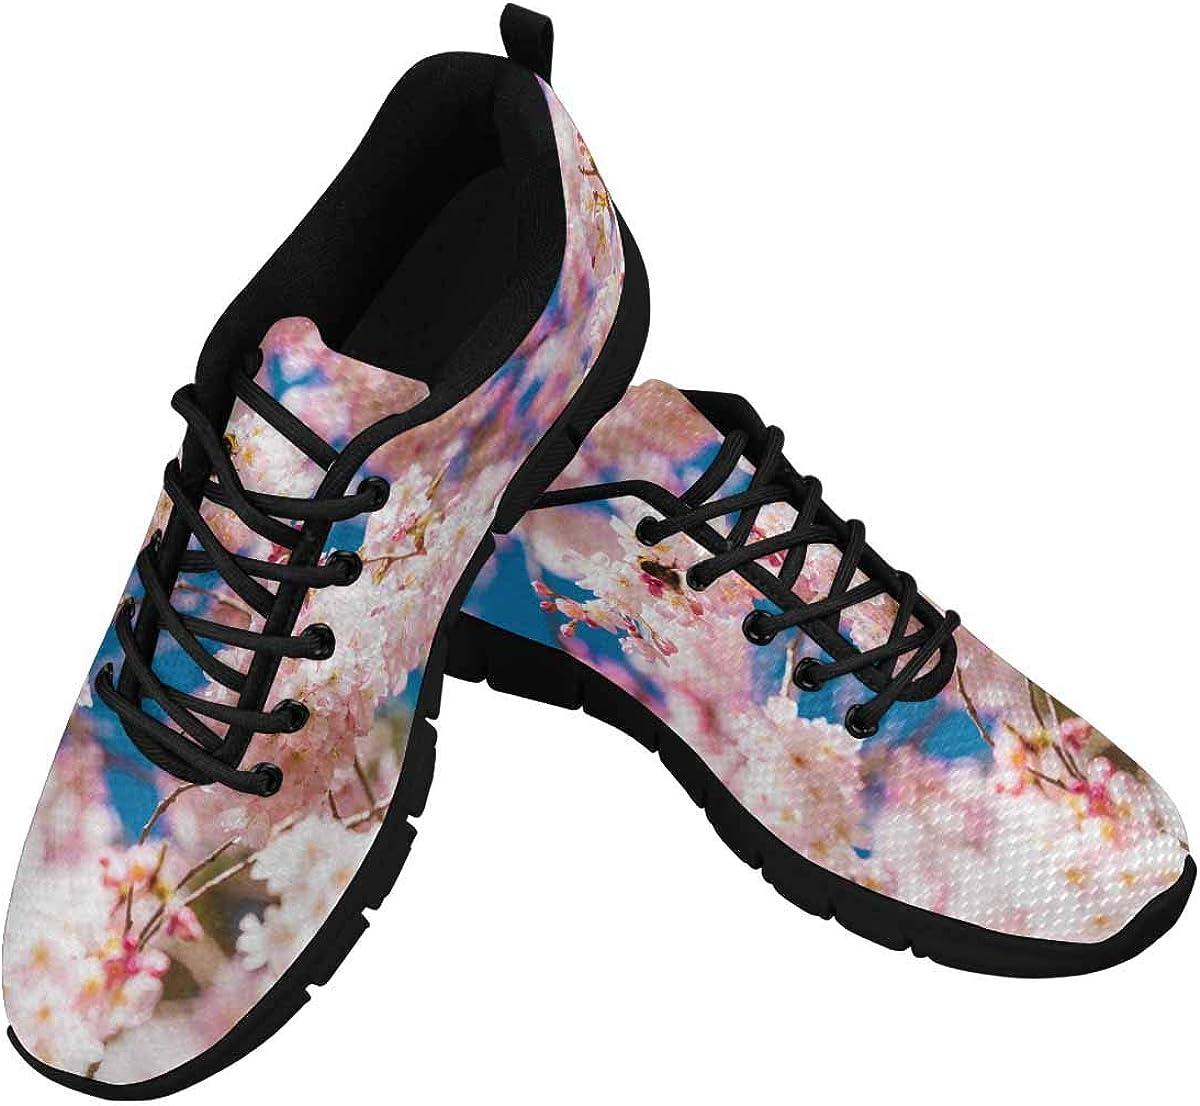 INTERESTPRINT Cherry Blossom in Spring Time Women's Athletic Walking Shoes Comfort Mesh Non Slip